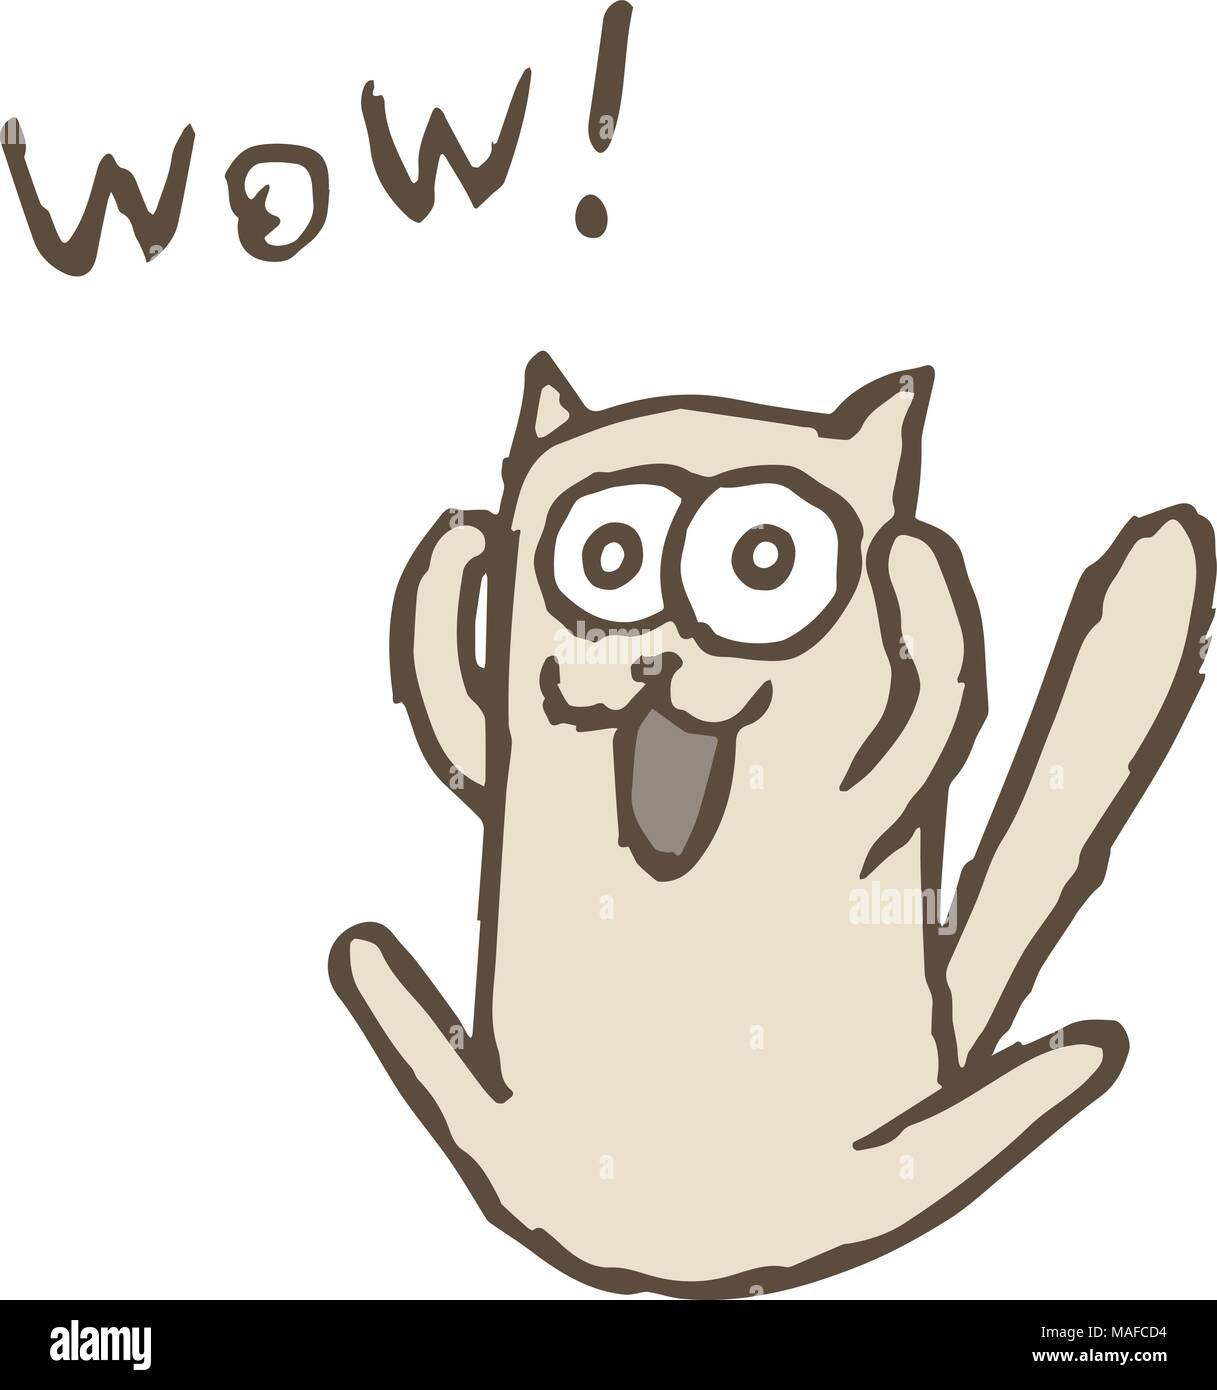 Cartoon cat Tik screaming Wow. Vector illustration. Funny imaginary character. - Stock Vector